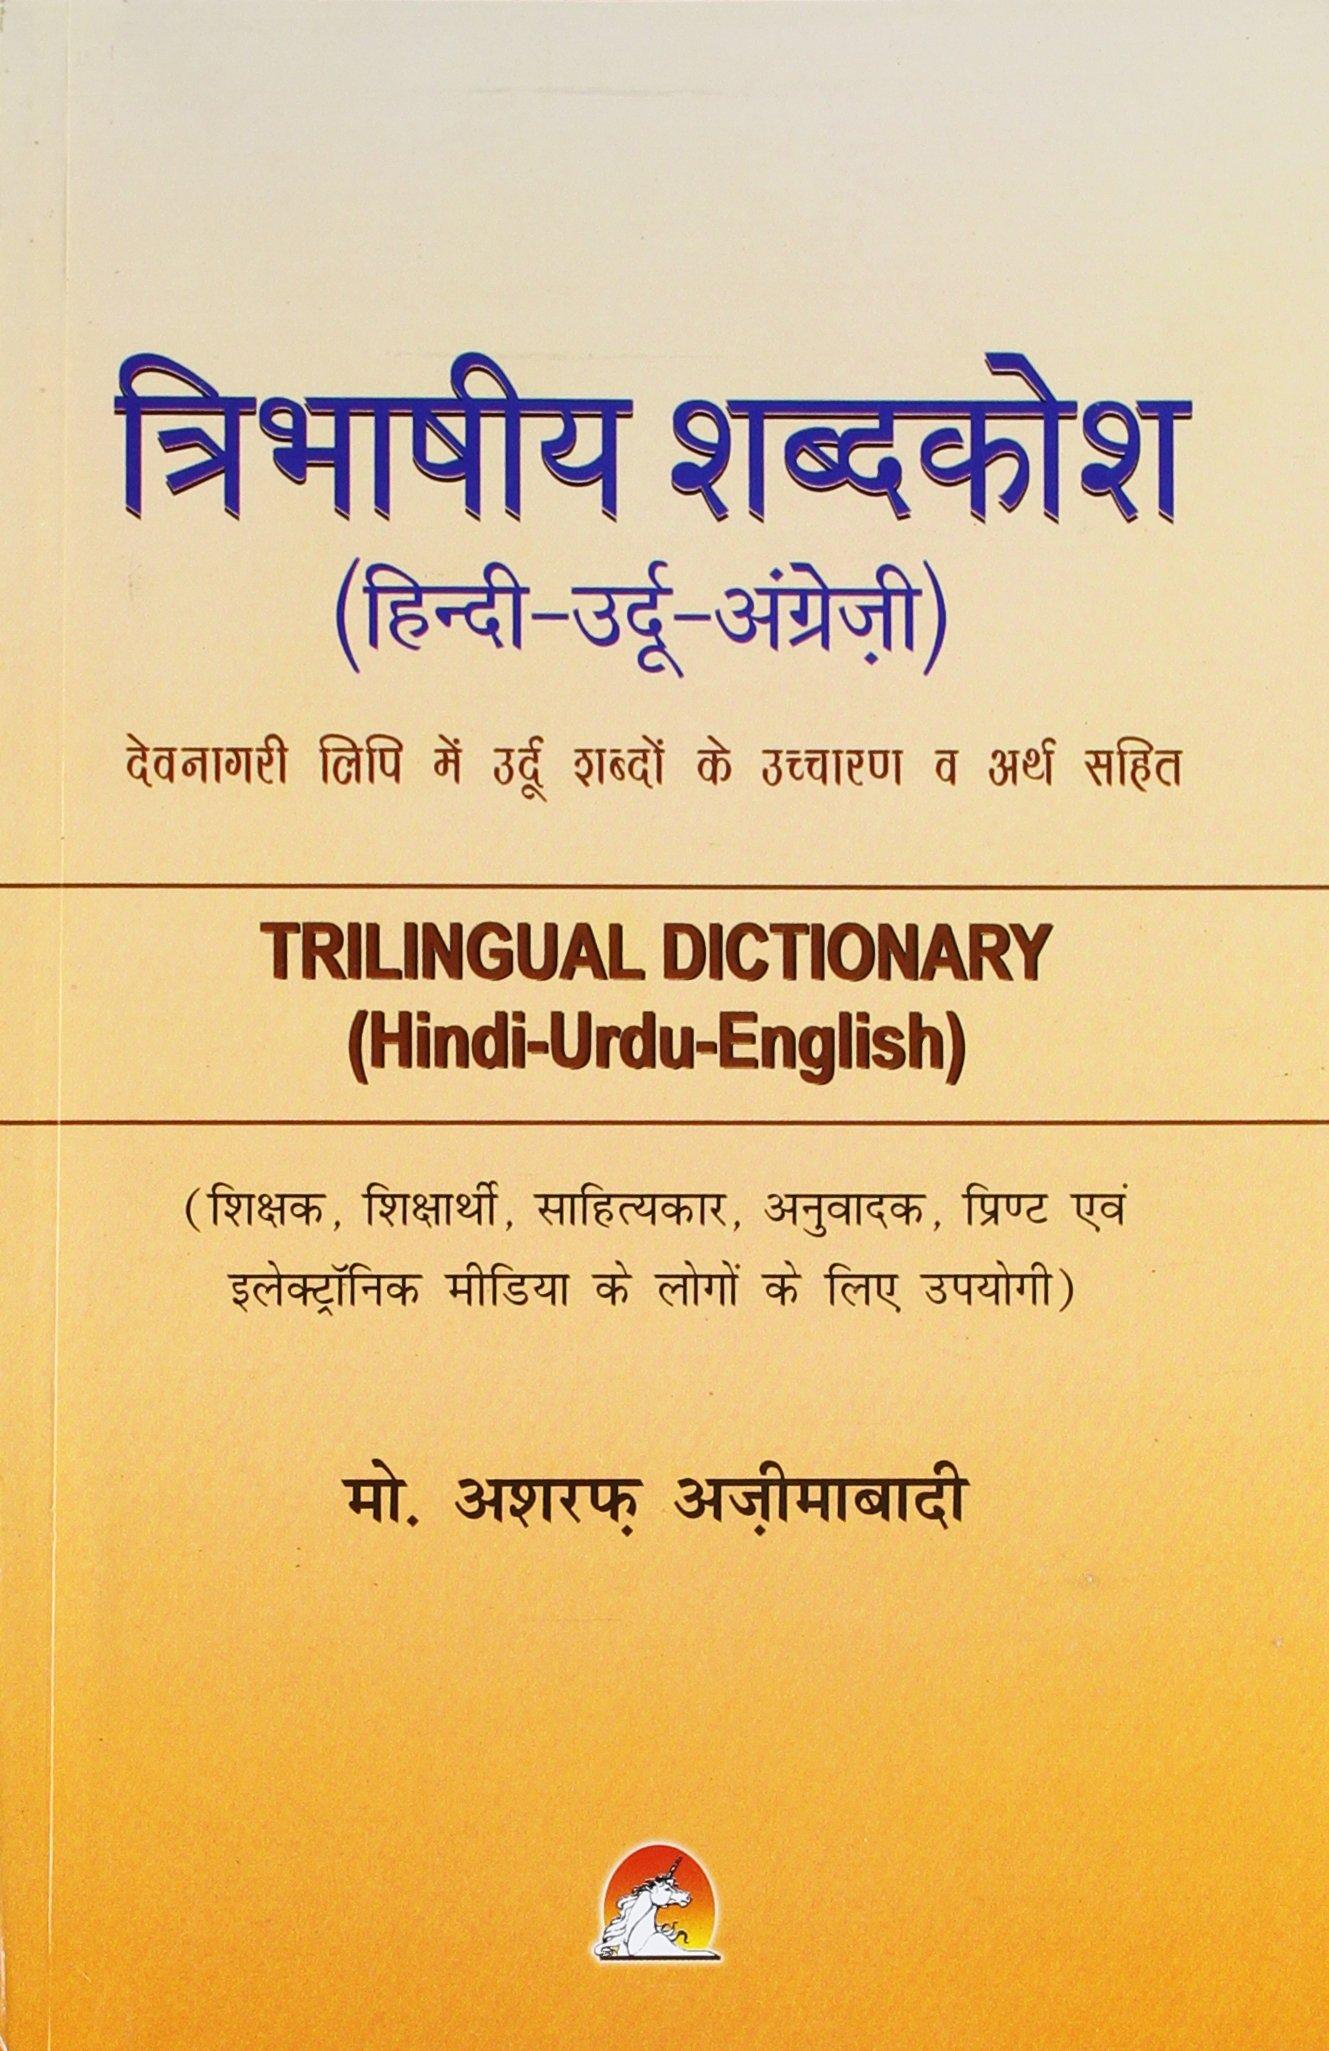 Buy Trilingual Dictionary Hindi Urdu English Book Online At Low